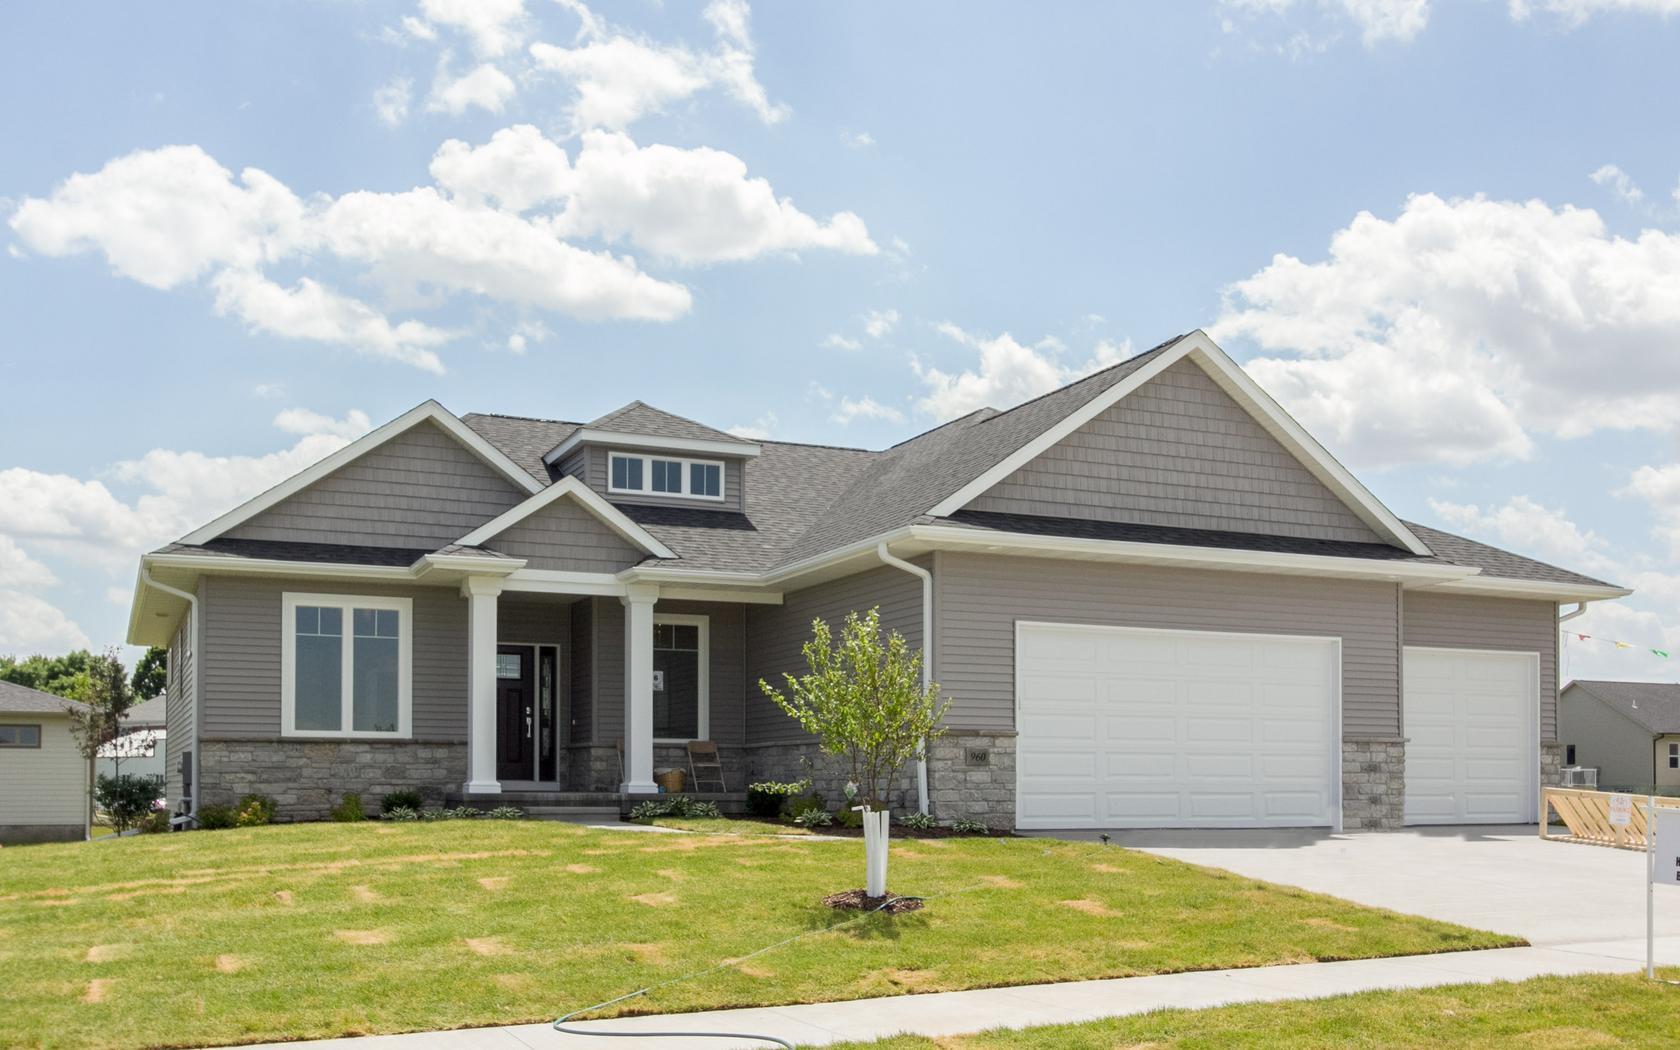 H&H Home Builders Exterior Design Image #38